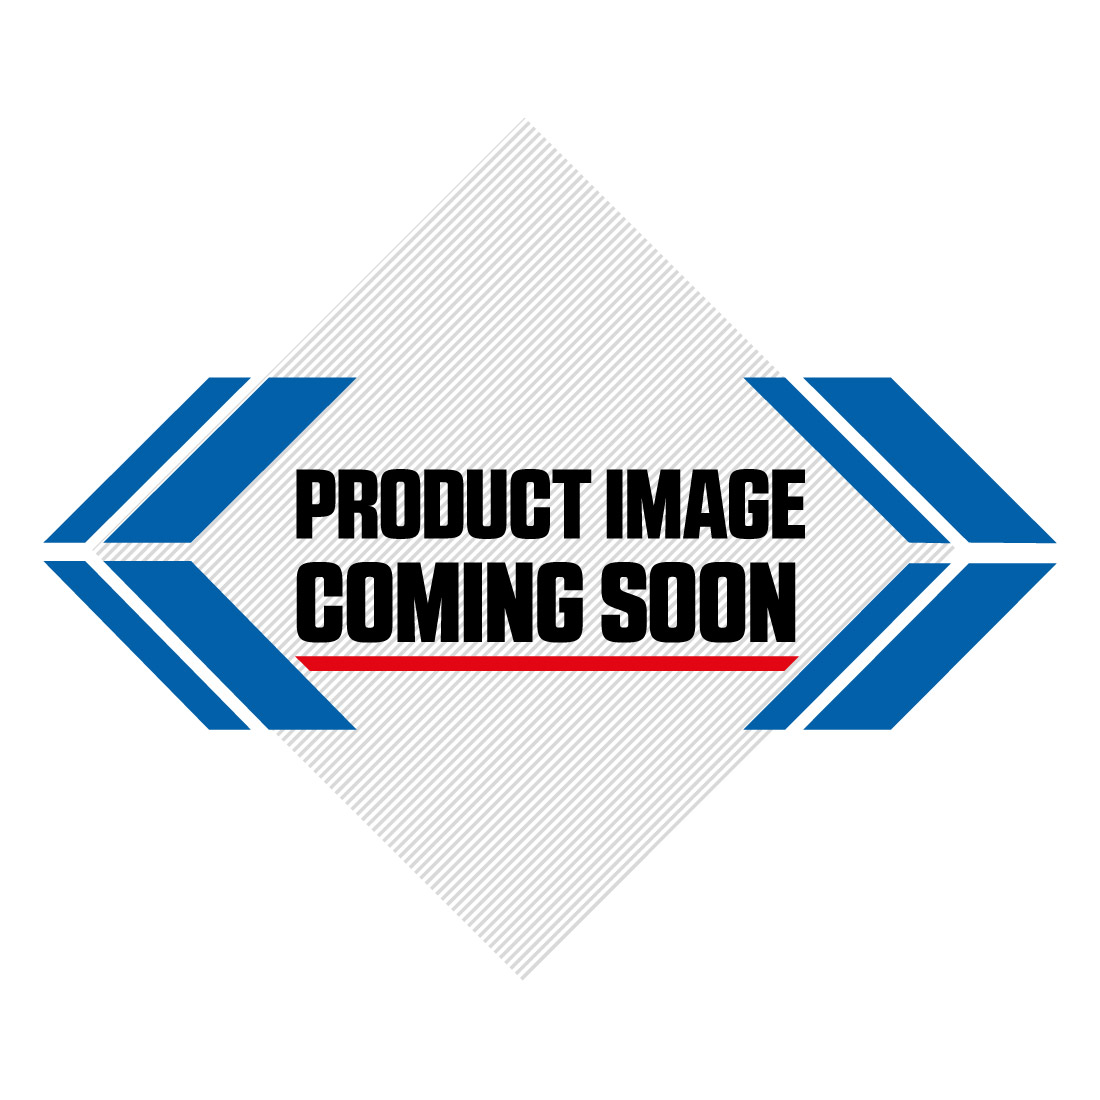 Sidi Black Ash Crossfire 3 SRS MX Boots Image-2